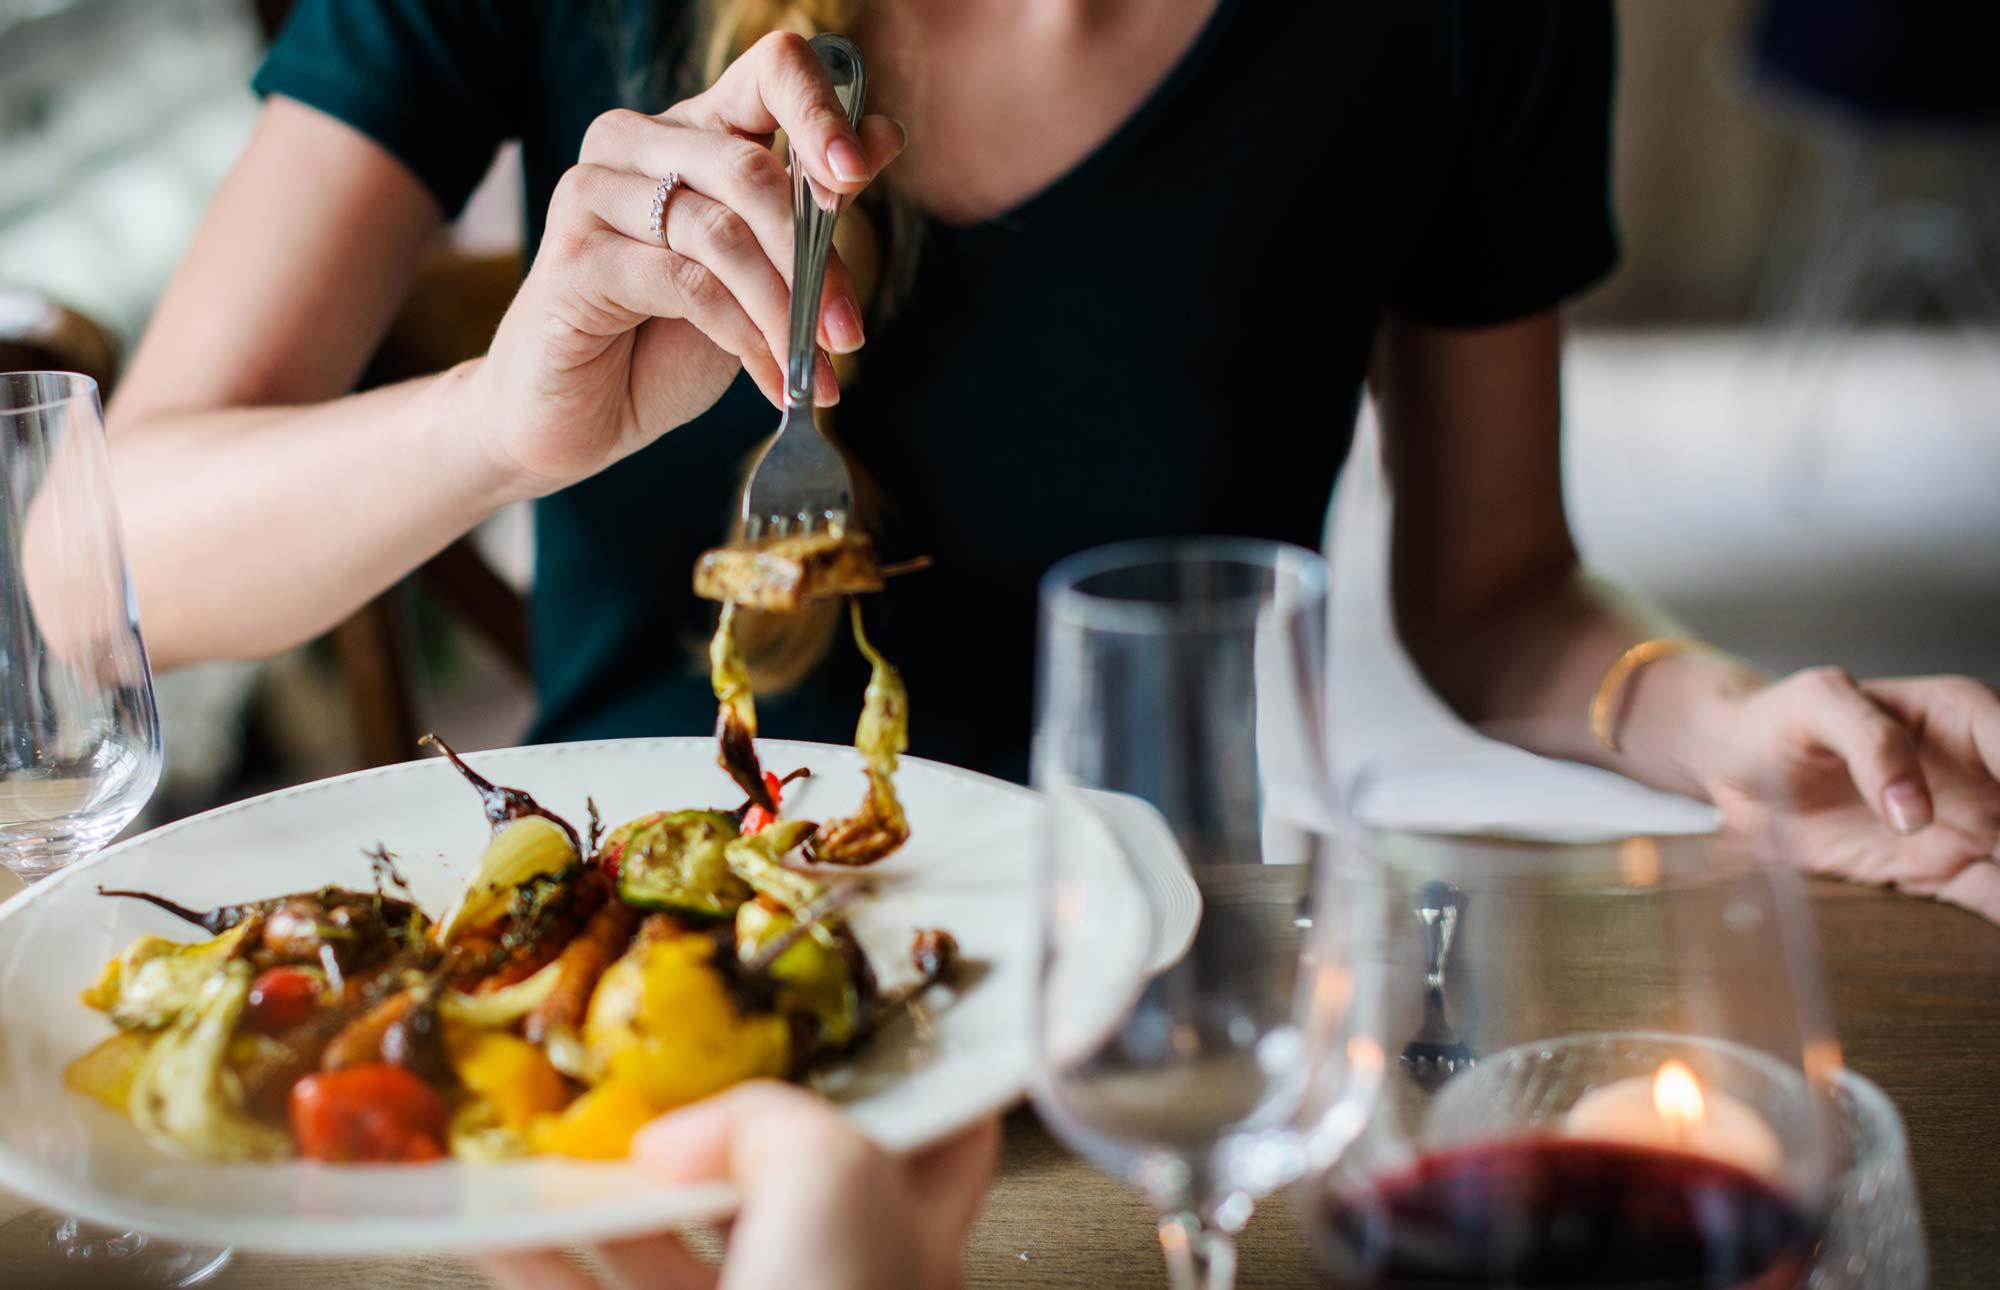 Kako trenirati čuječnost med jedjo